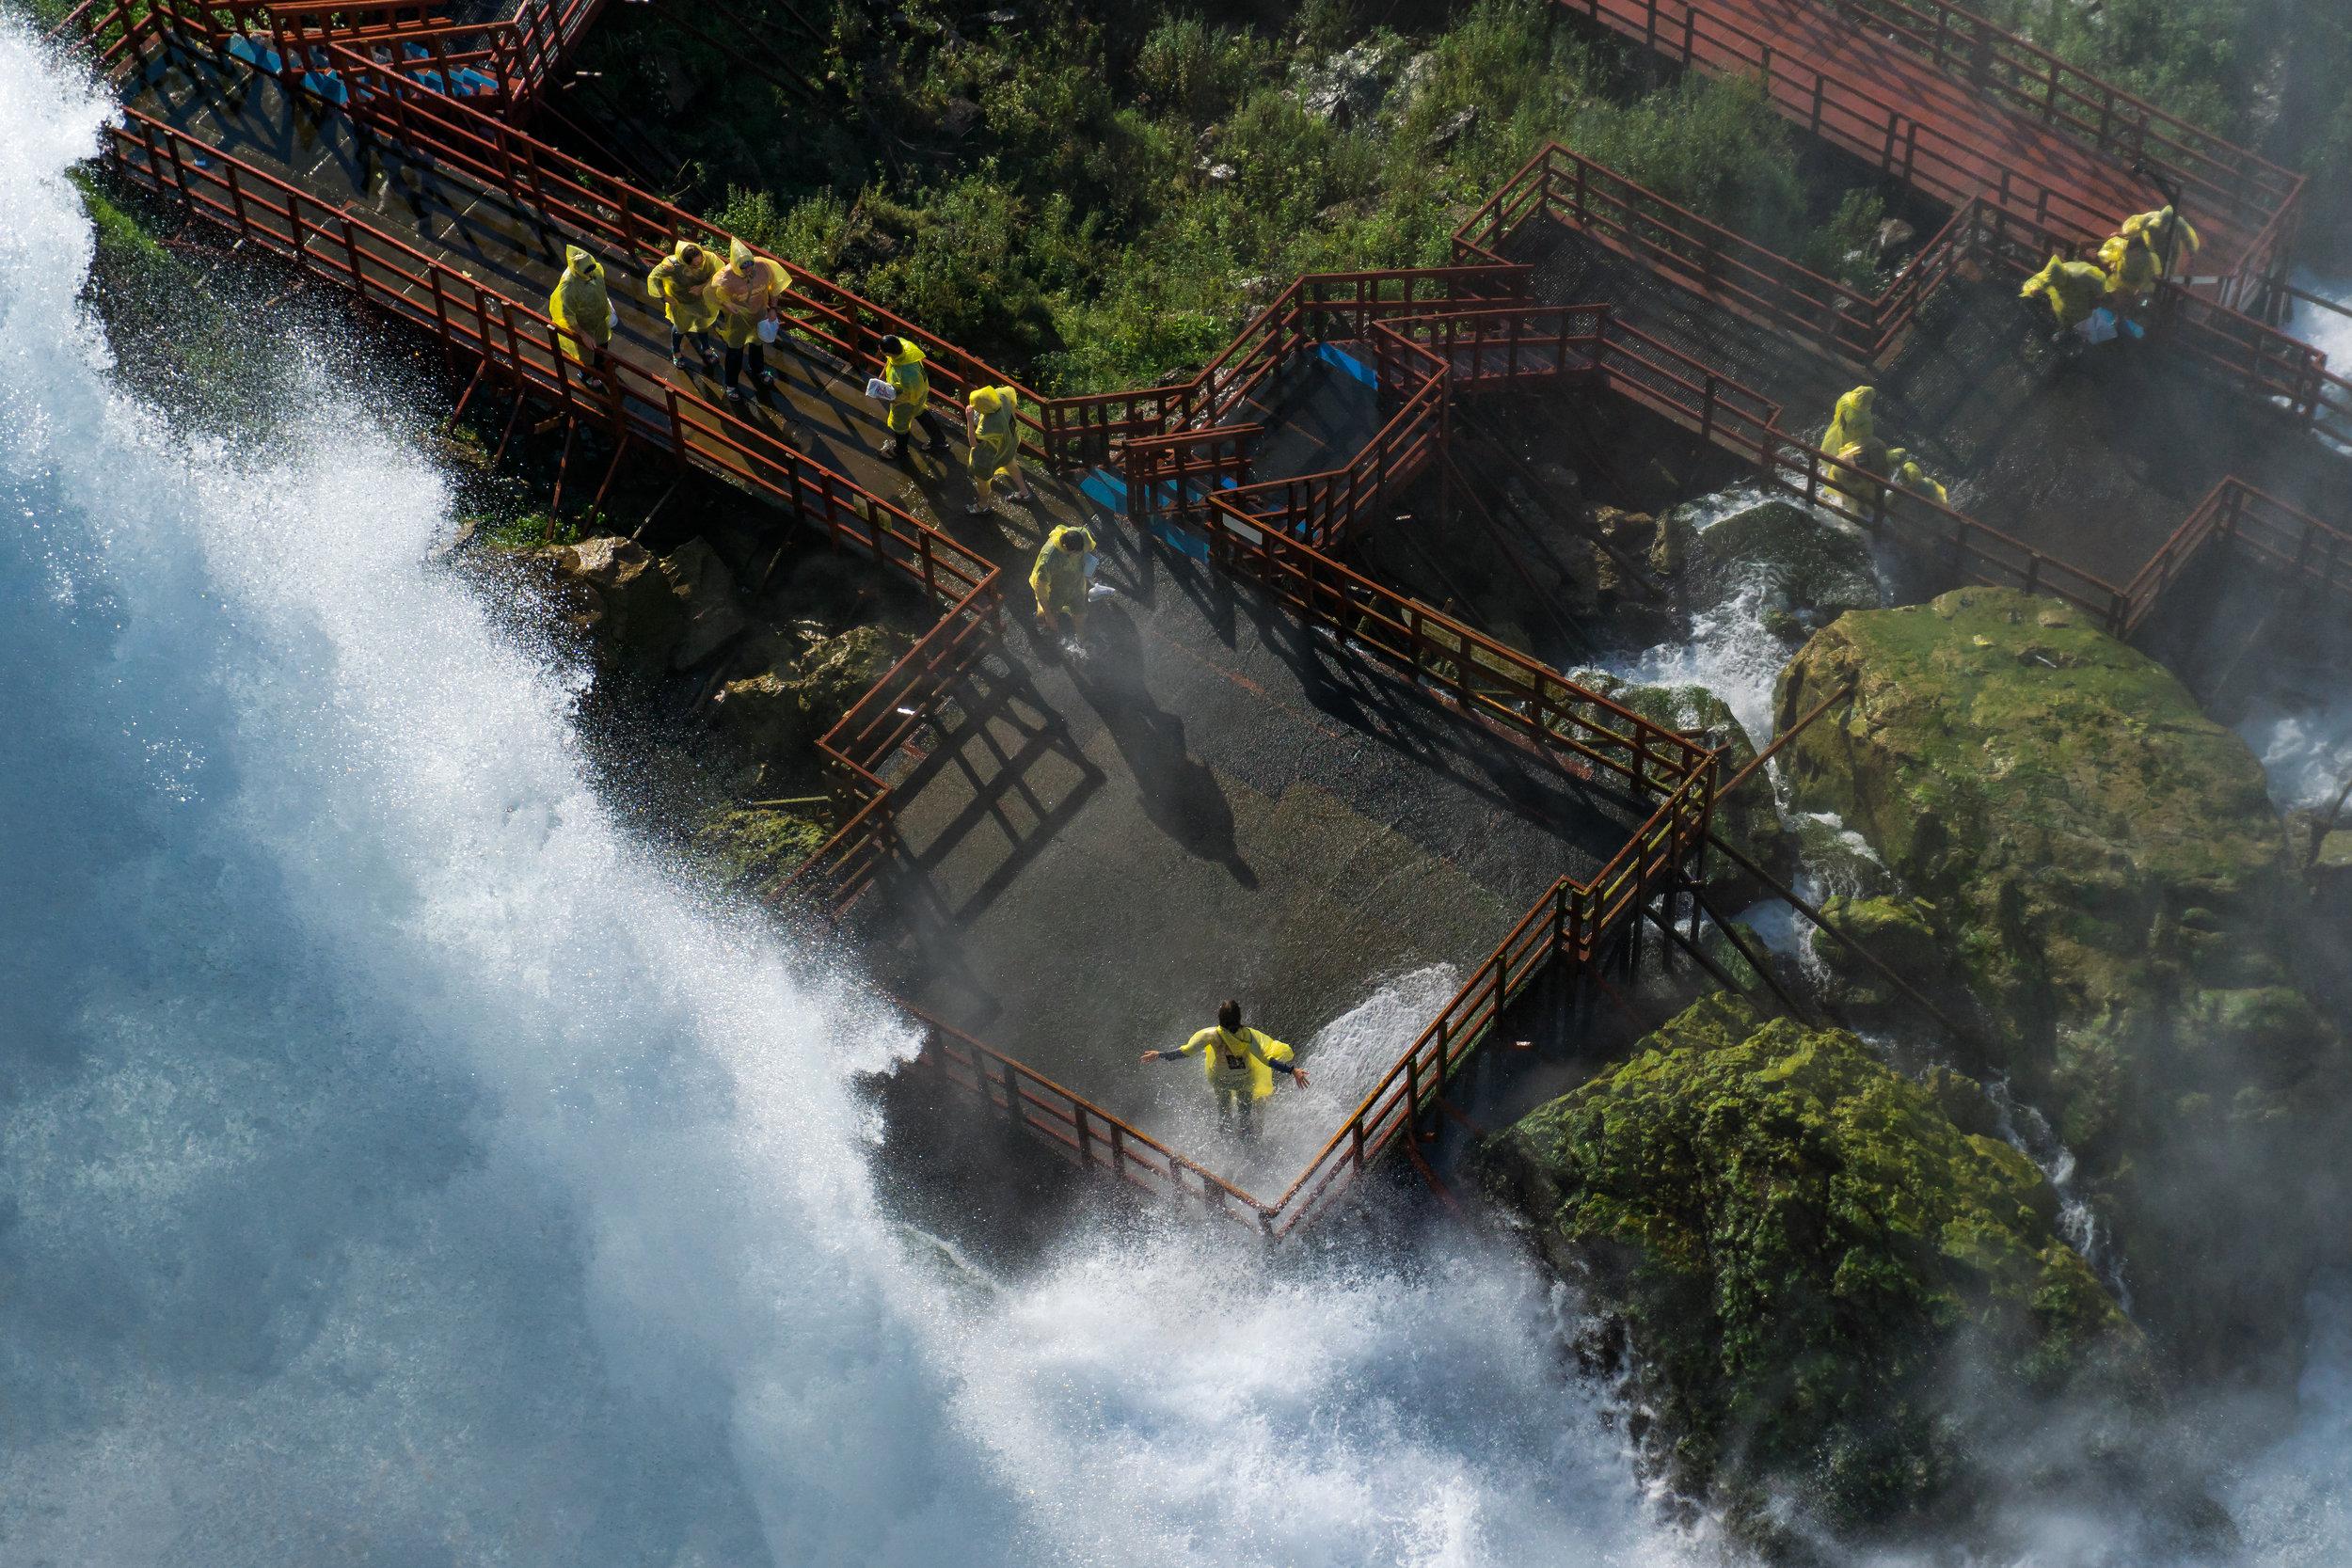 1642 - Niagara Falls 2018 - Bridal Veil Hurrican Deck